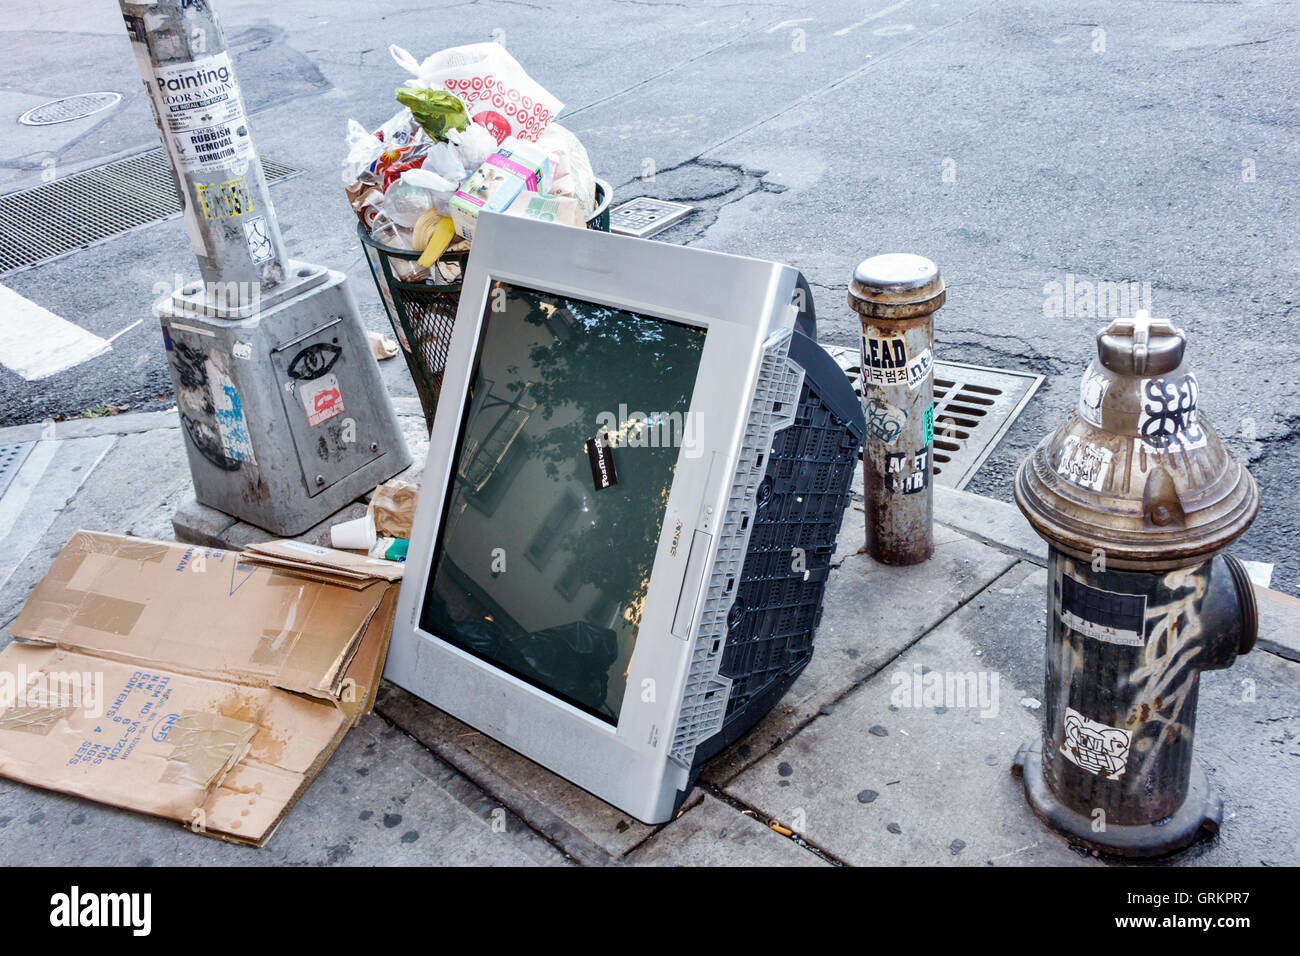 Lower Manhattan New York City NYC NY street corner trash garbage waste illegal dumping television set environment - Stock Image